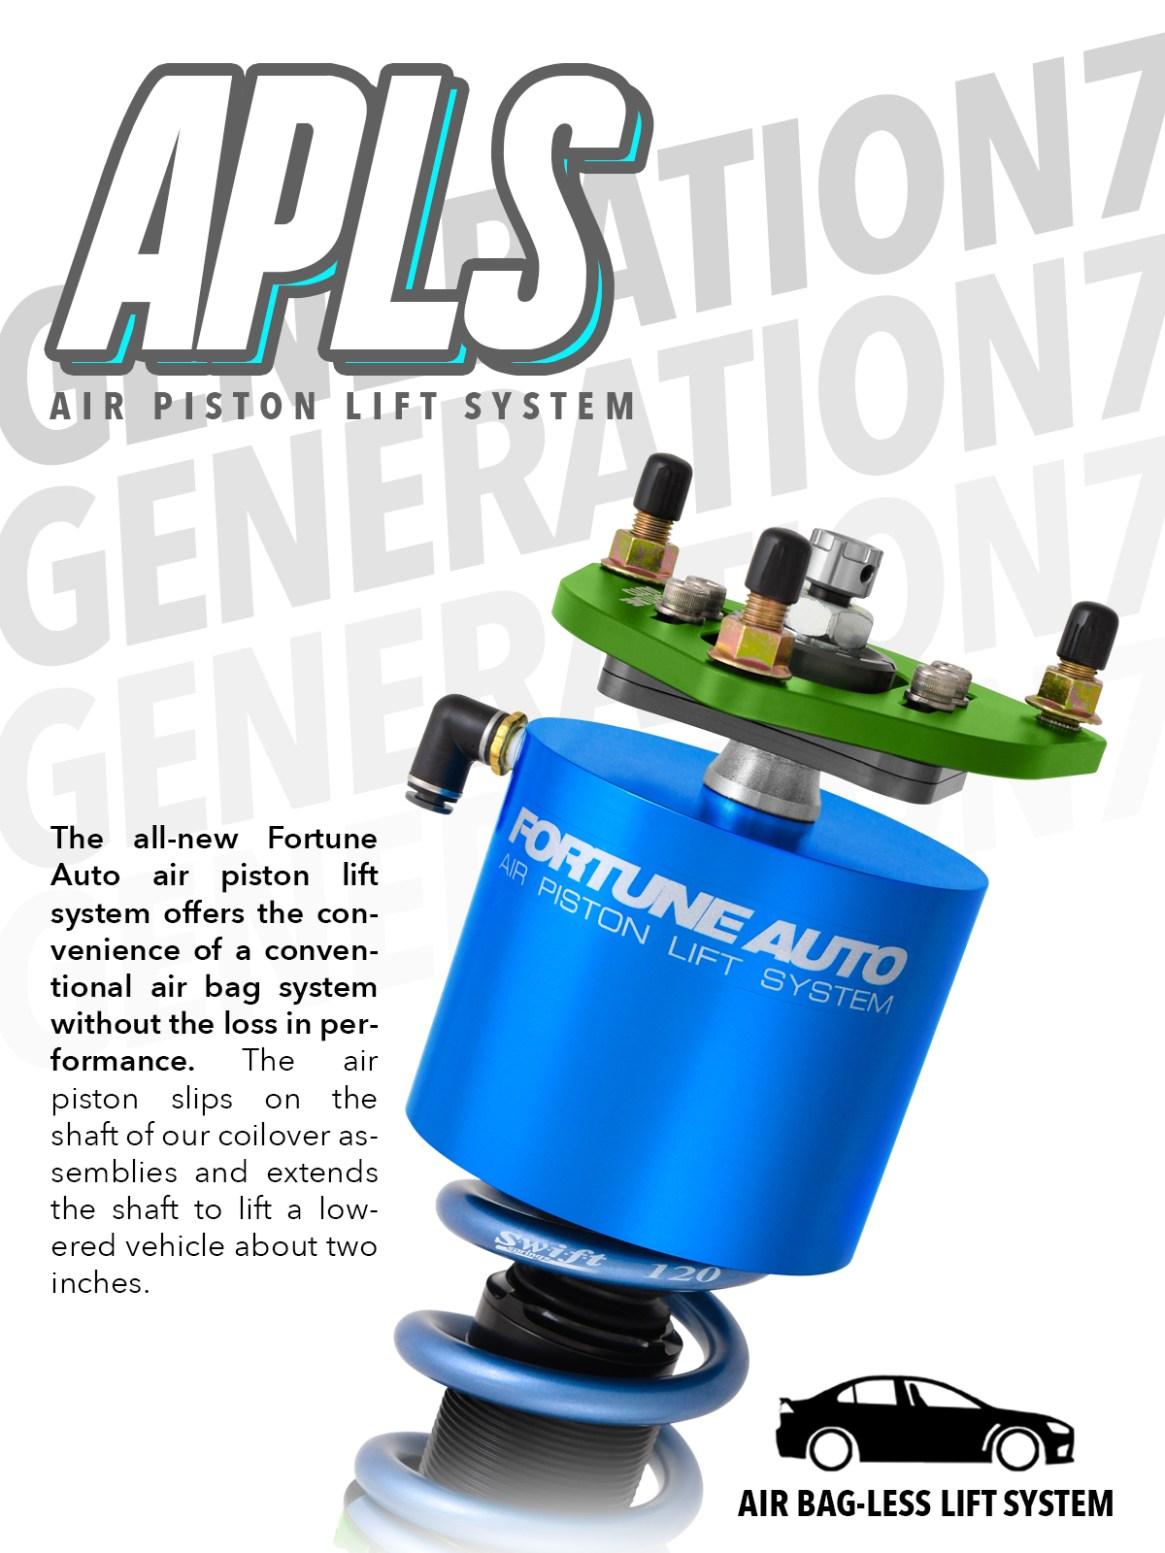 Air Piston Lift System